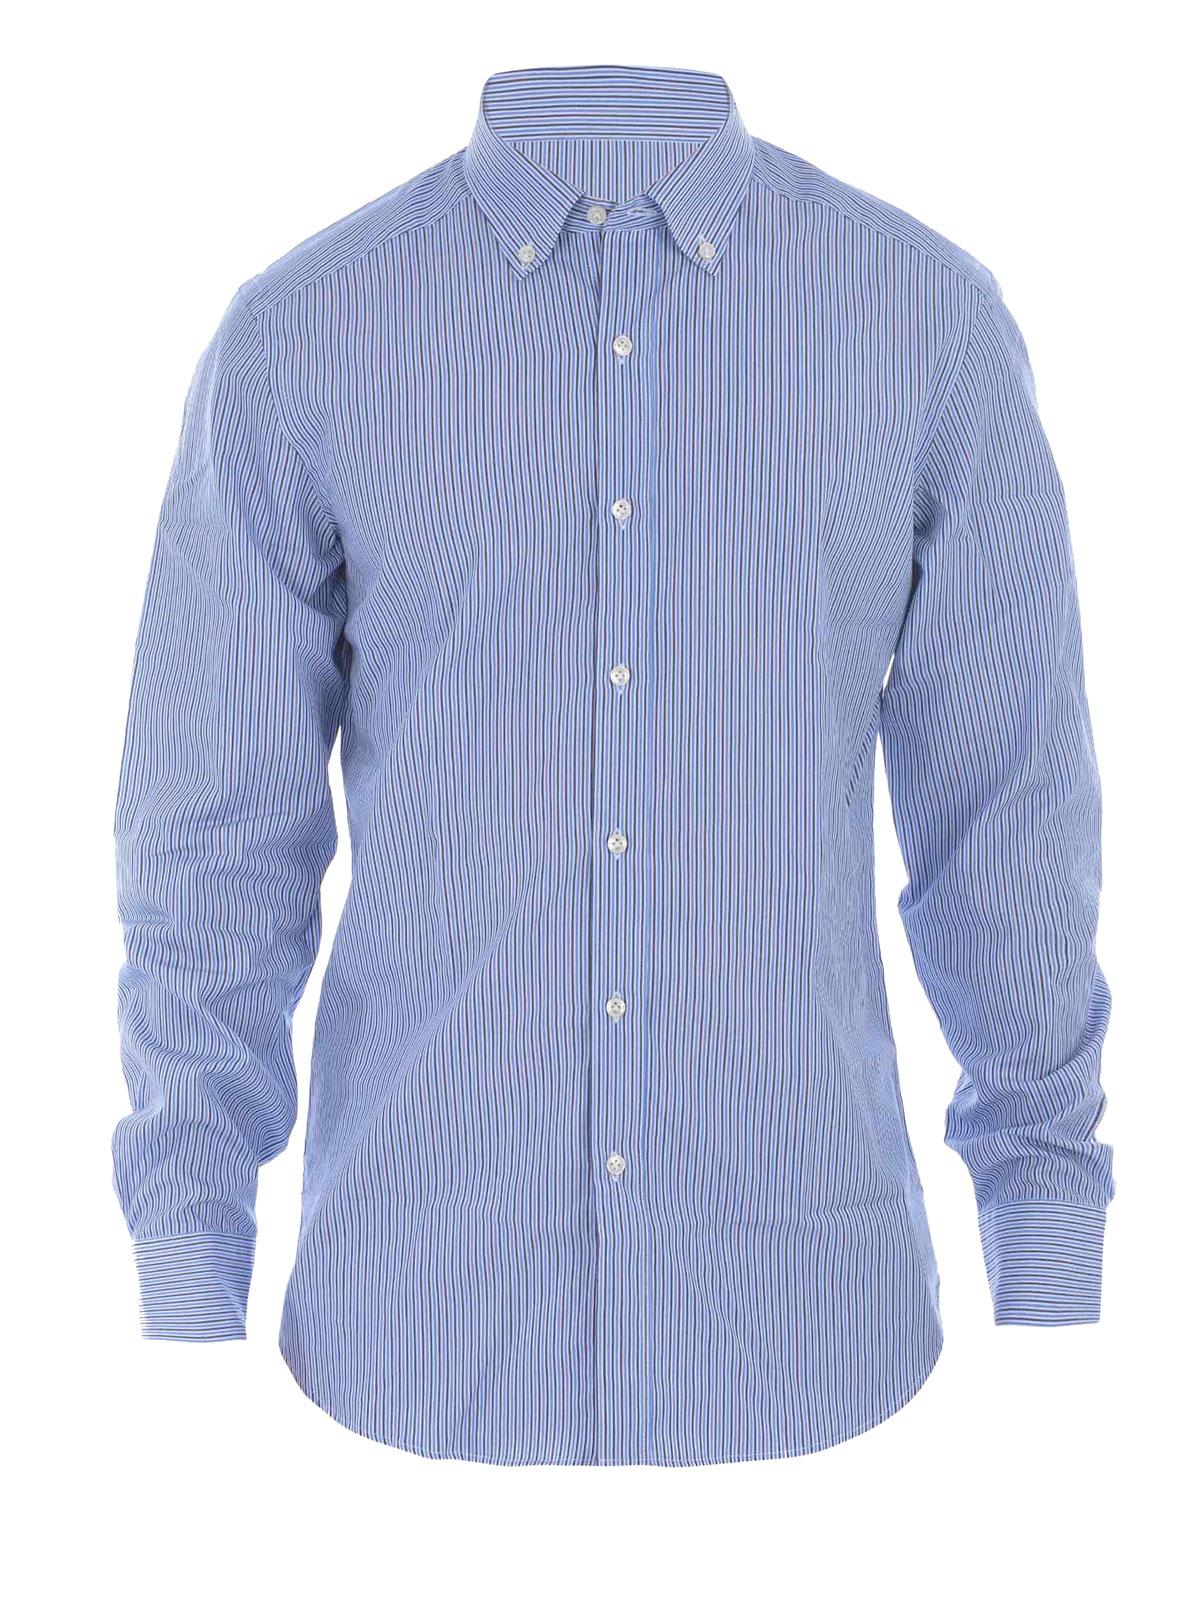 Striped Cotton Button Down Shirt By Fay Shirts Ikrix